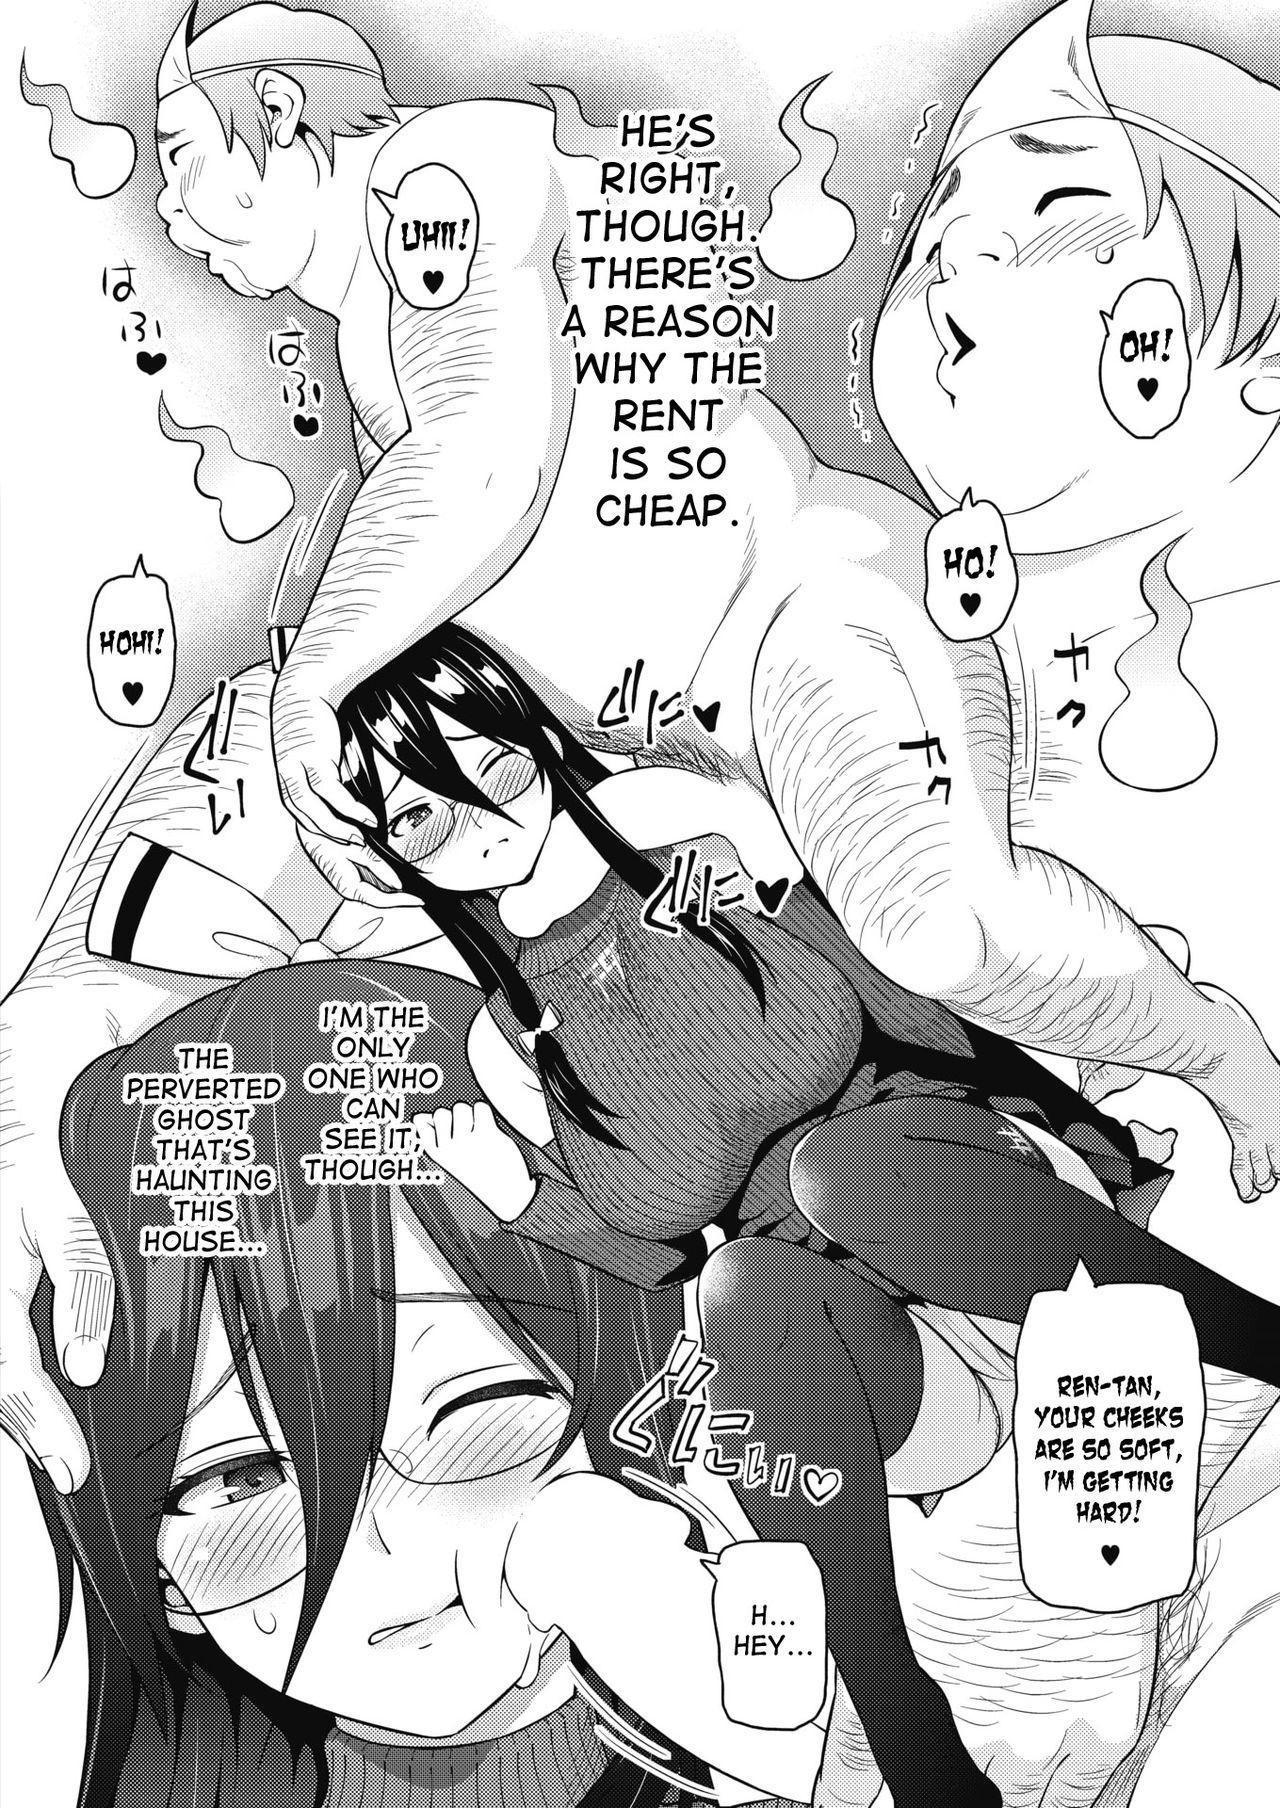 Tsukaretemo Koi ga Shitai! | Even If I'm Haunted by a Ghost, I still want to Fall in Love! 1